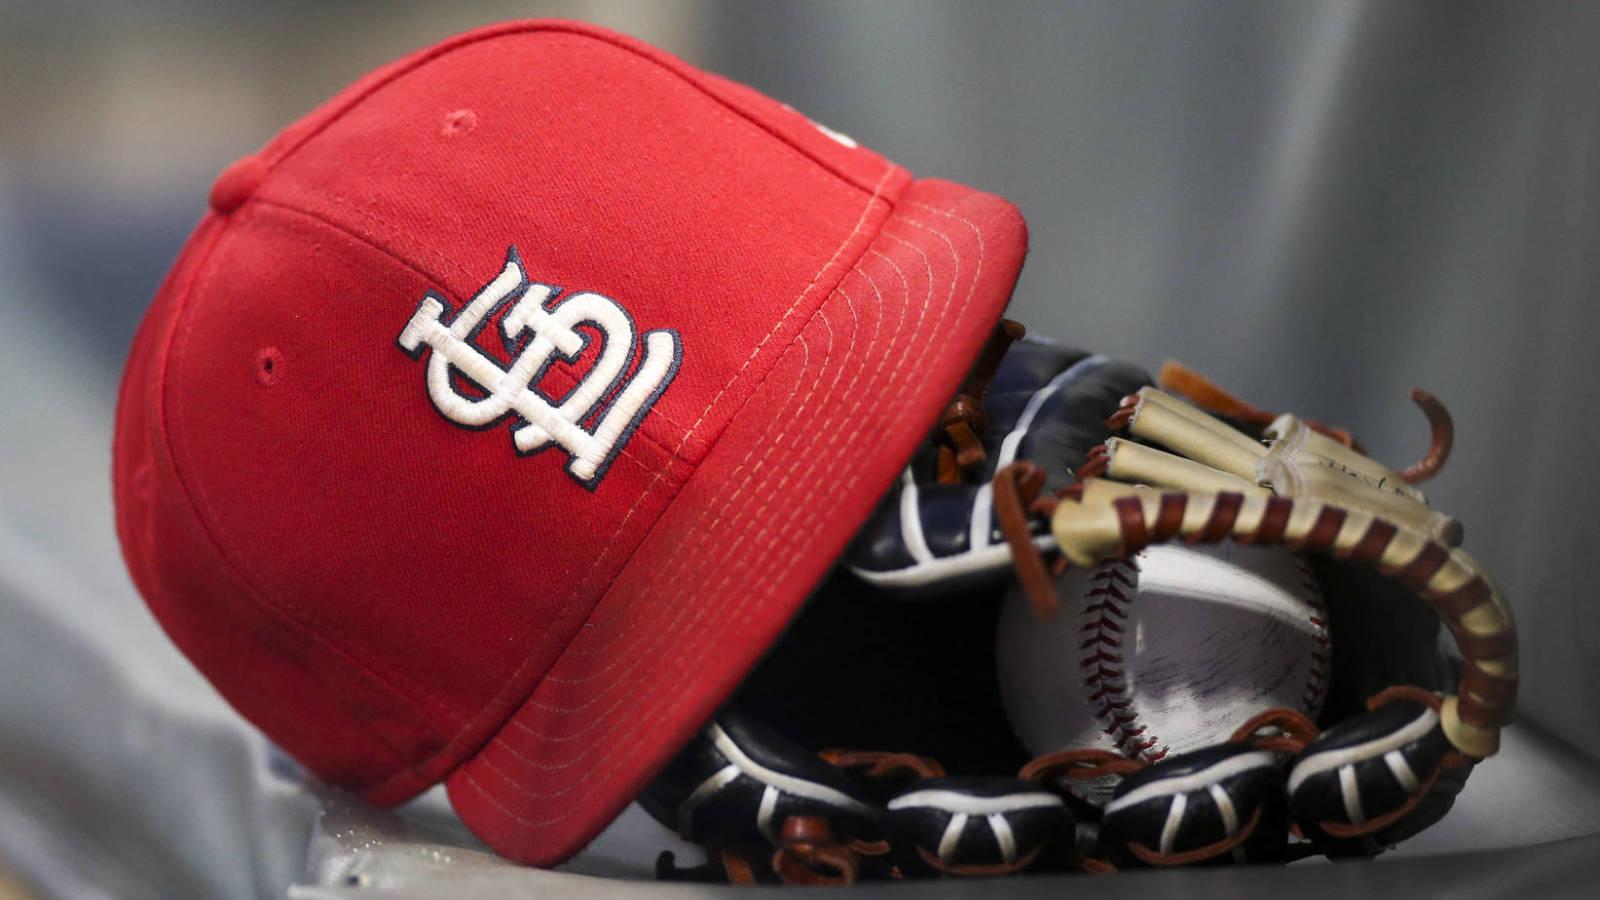 Cardinals-Cubs weekend series postponed following positive coronavirus test